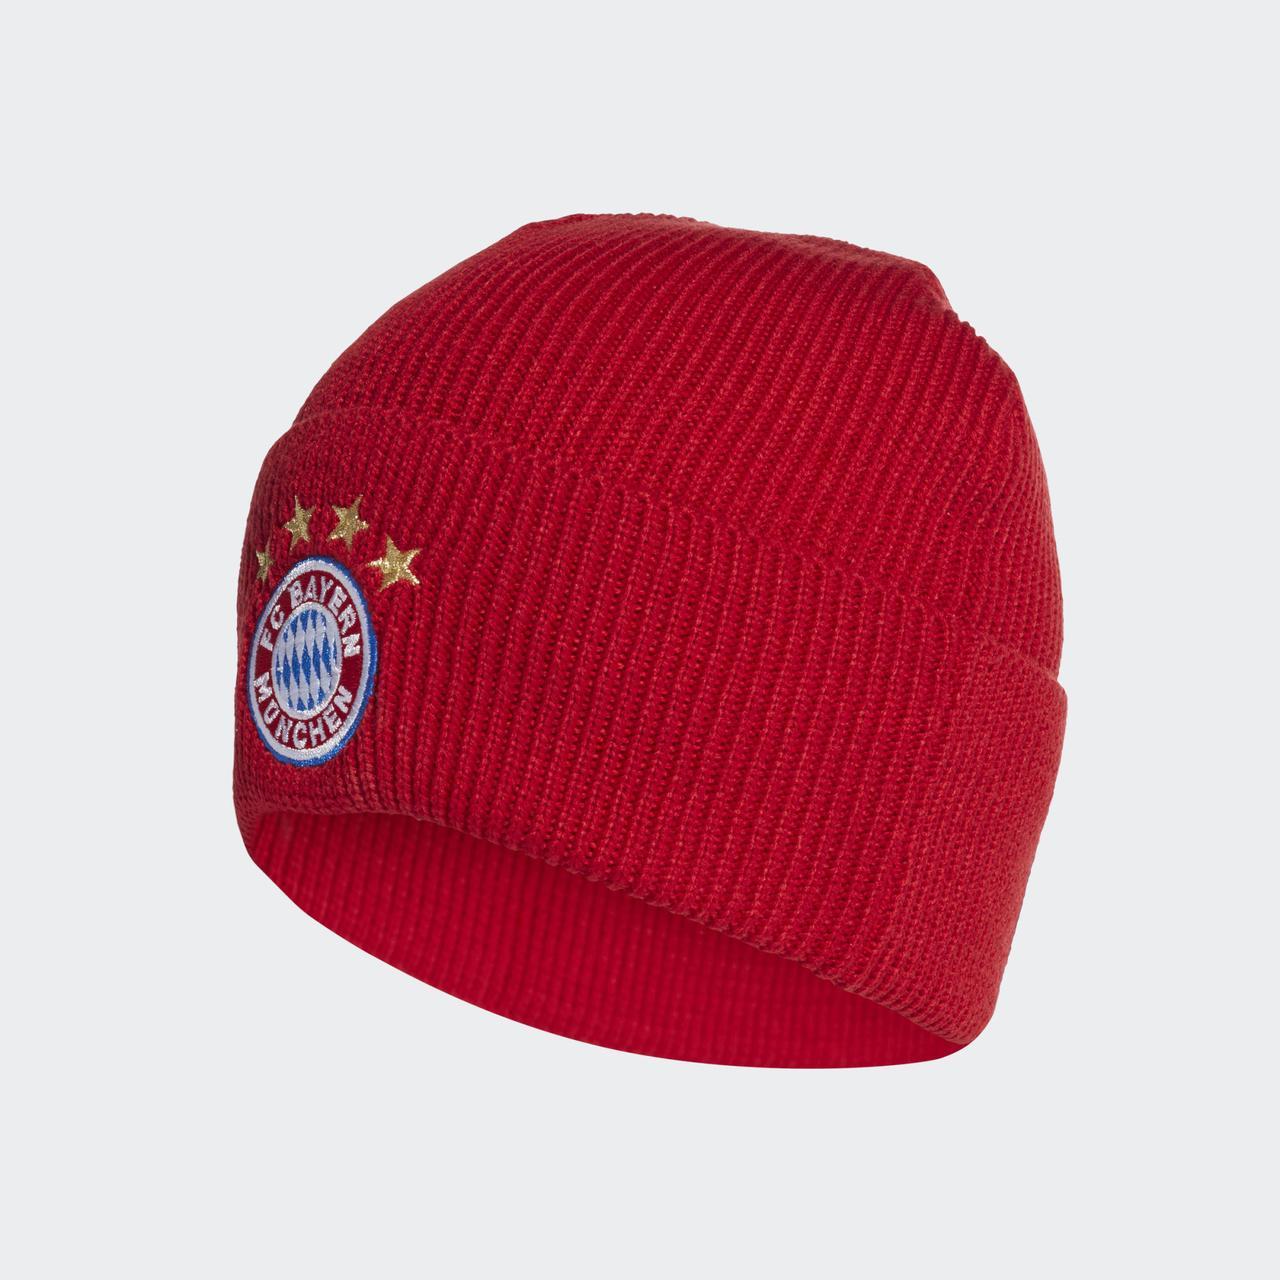 Шапка  adidas FC Bayern Beanie FS0192 Красный